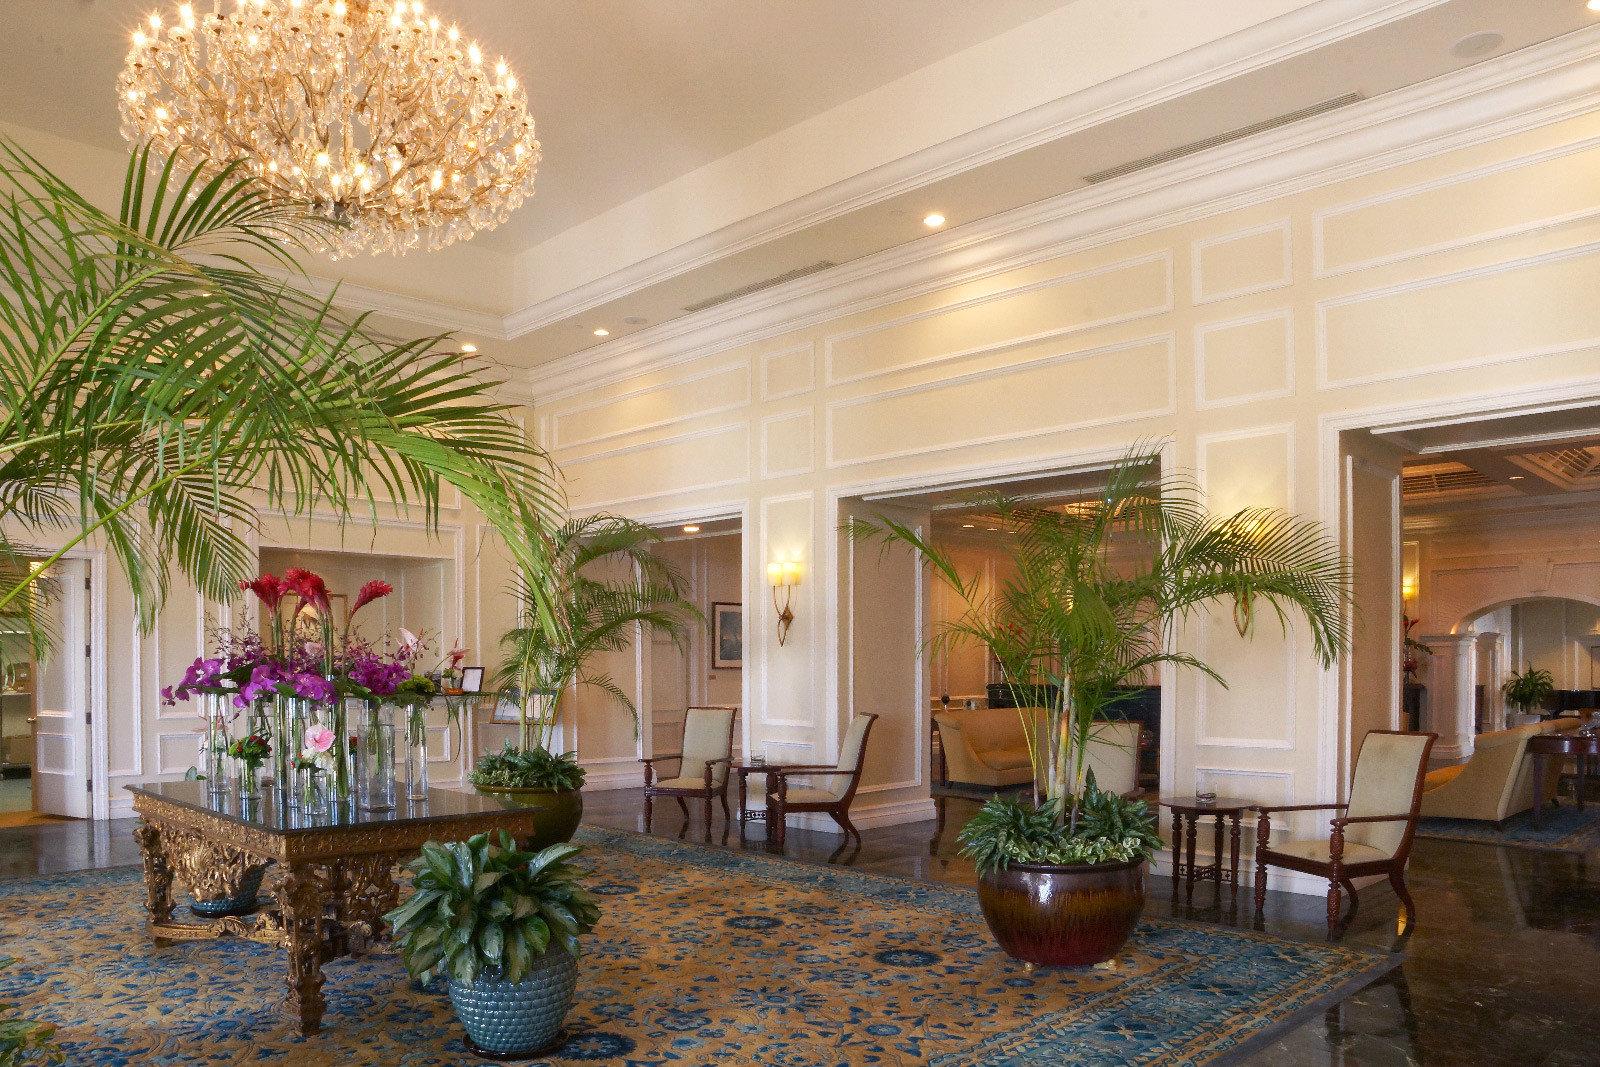 Beachfront Lobby Lounge Modern property plant home condominium living room mansion floristry Courtyard lighting Villa Suite